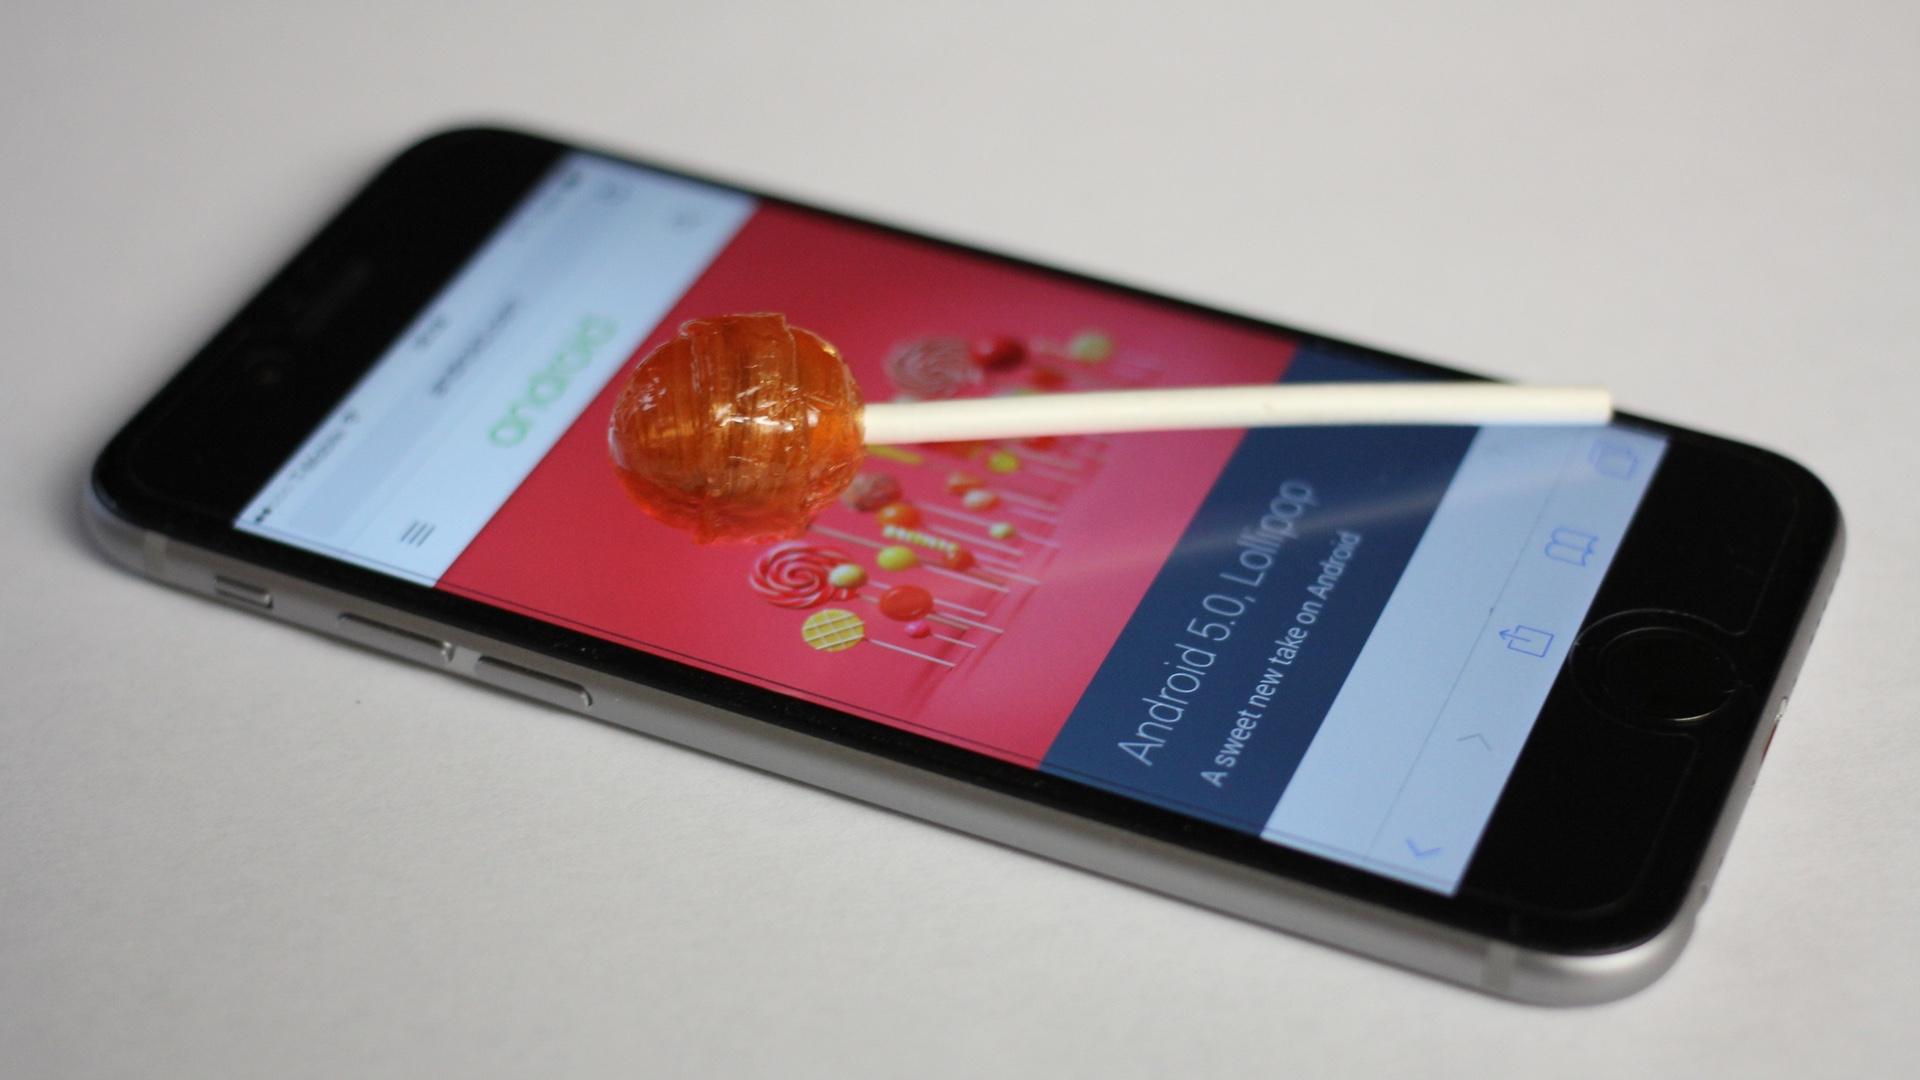 Lollipop on iPhone 6